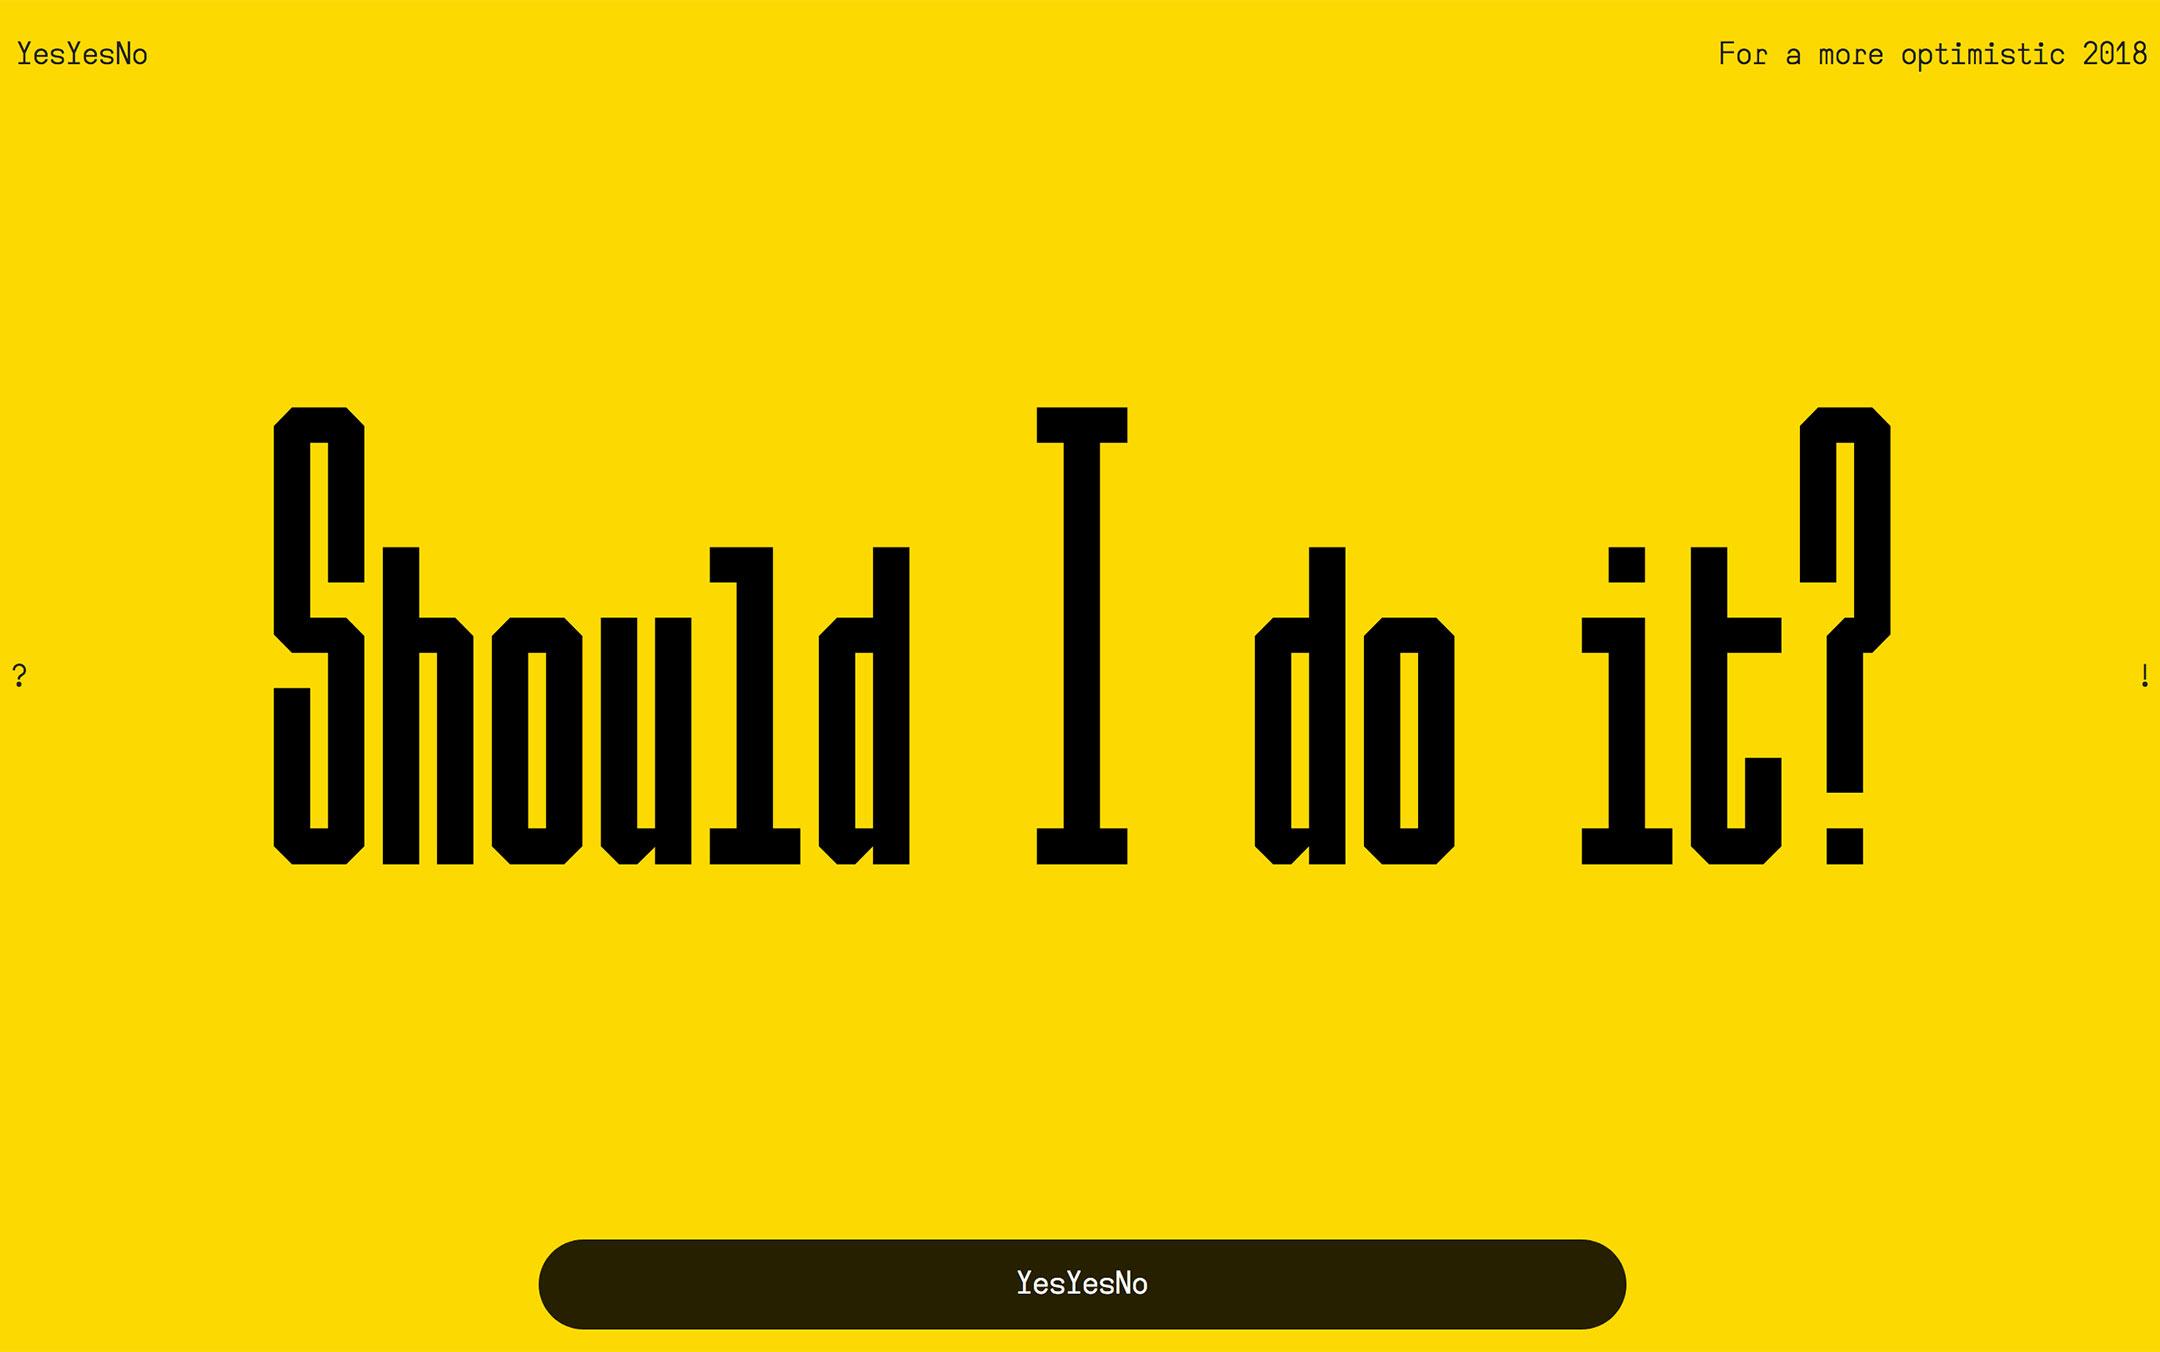 should i do it?